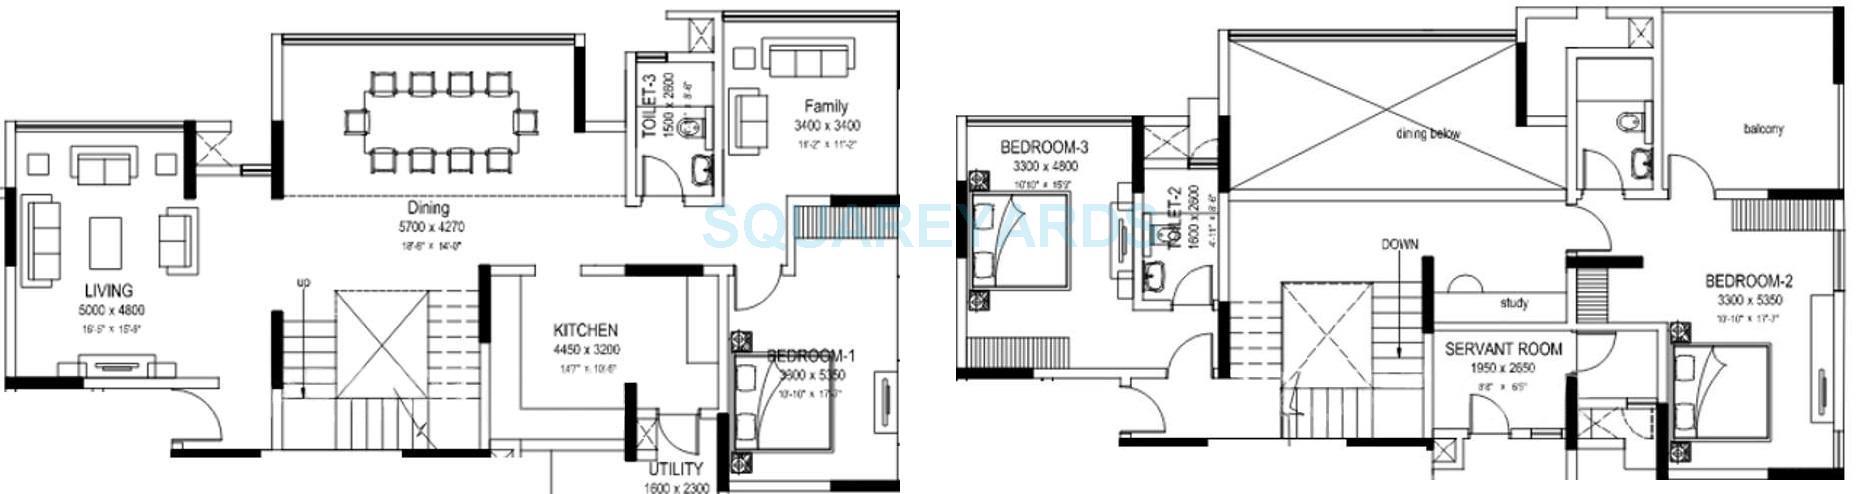 sobha elanza apartment 3bhk 3400sqft 1